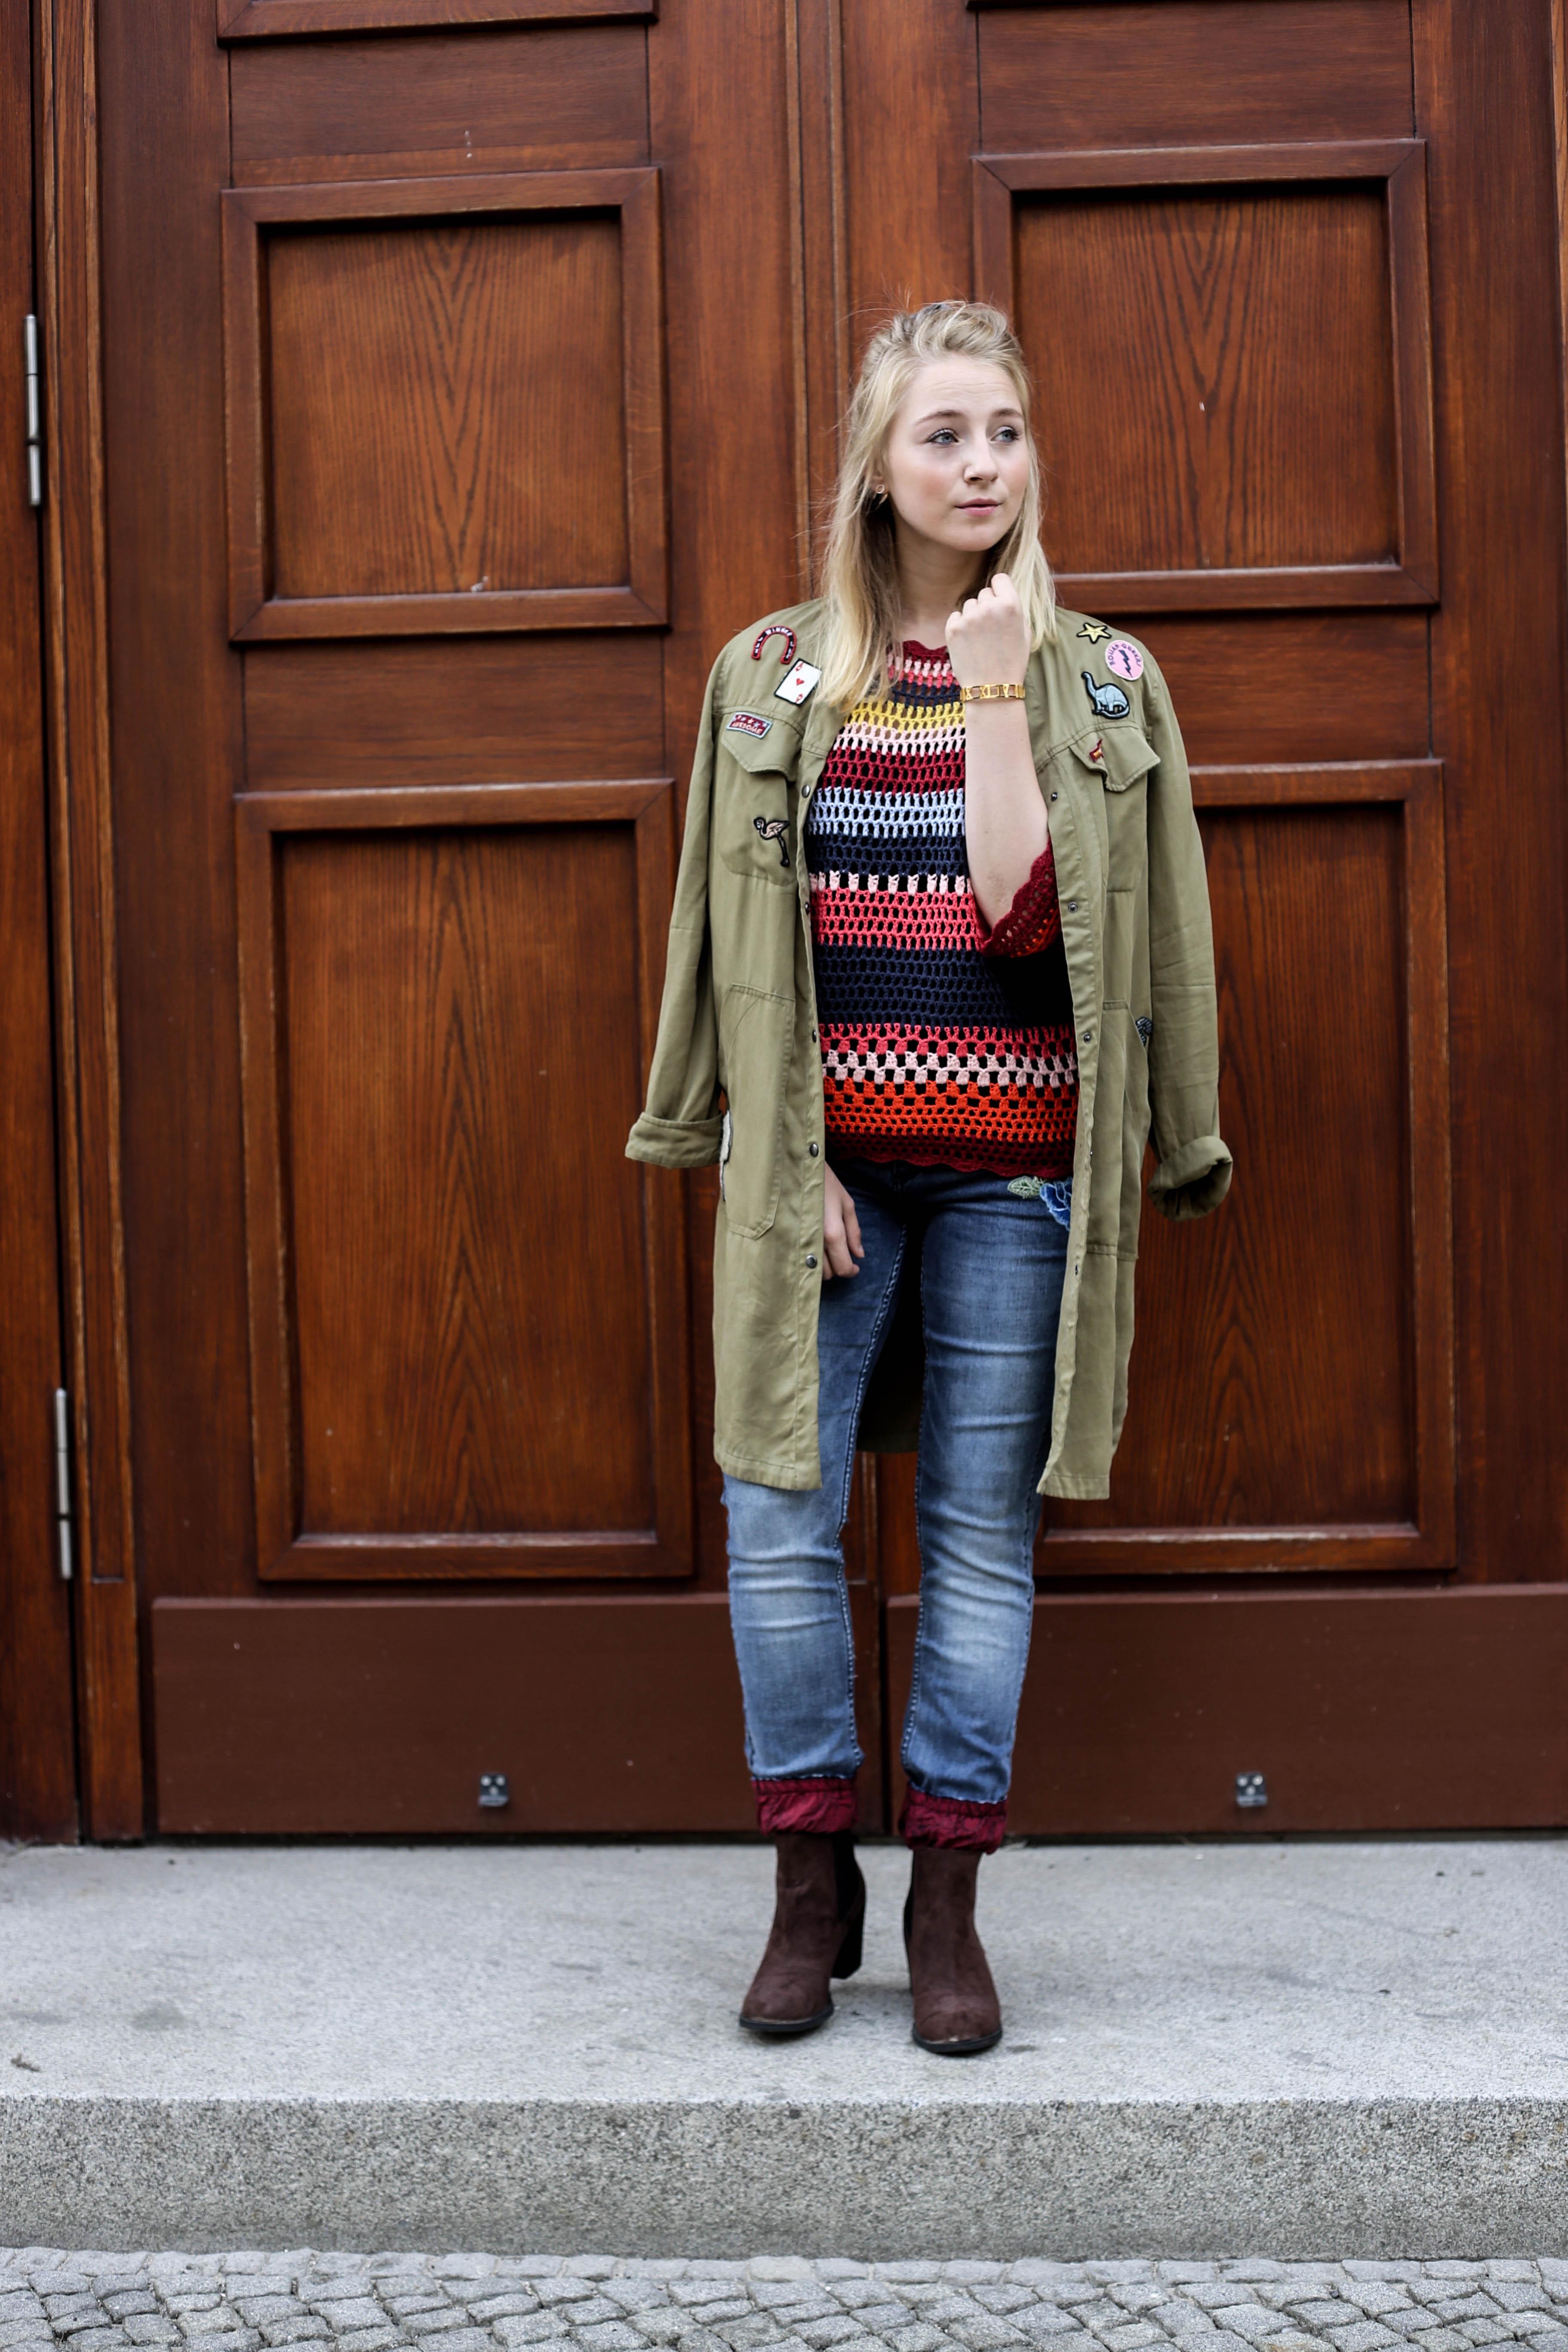 spaetsommer-look-desigual-bunt-alltag-fashionblog-modeblog-berlin_3897